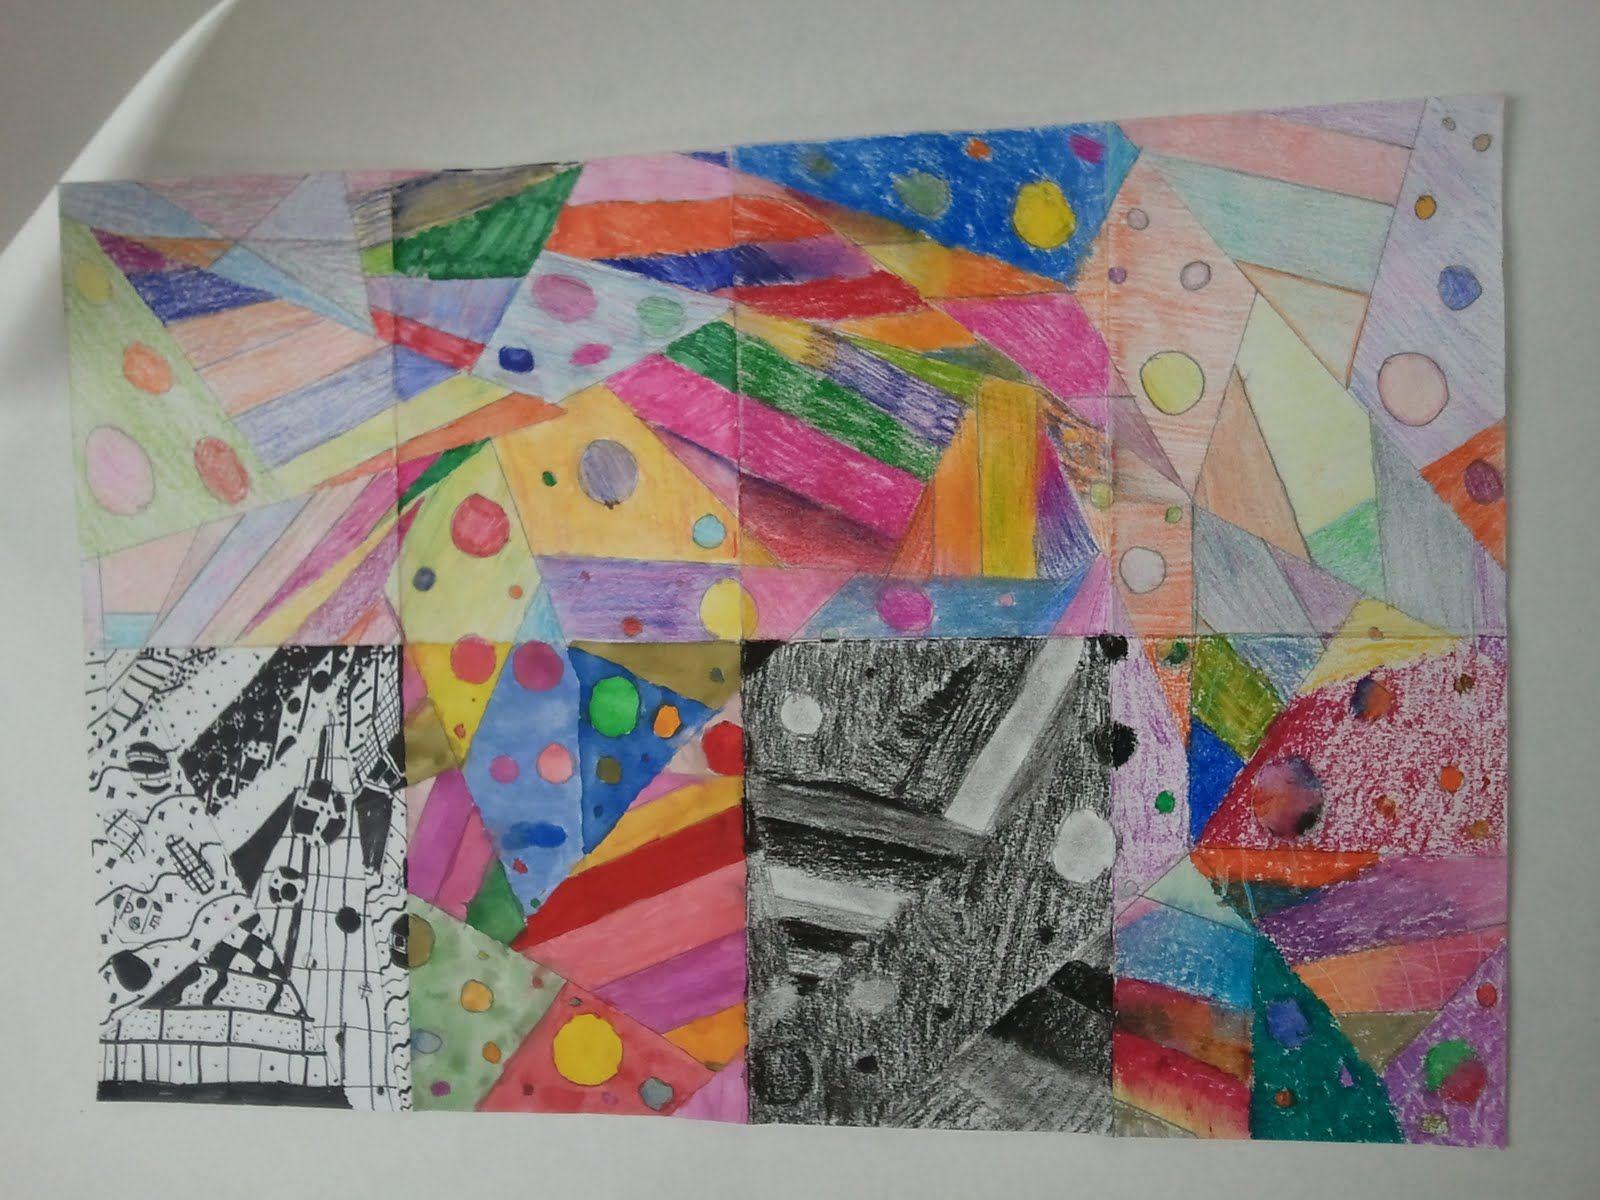 8 Art Elements : Medium project good for elements or principles of art kid